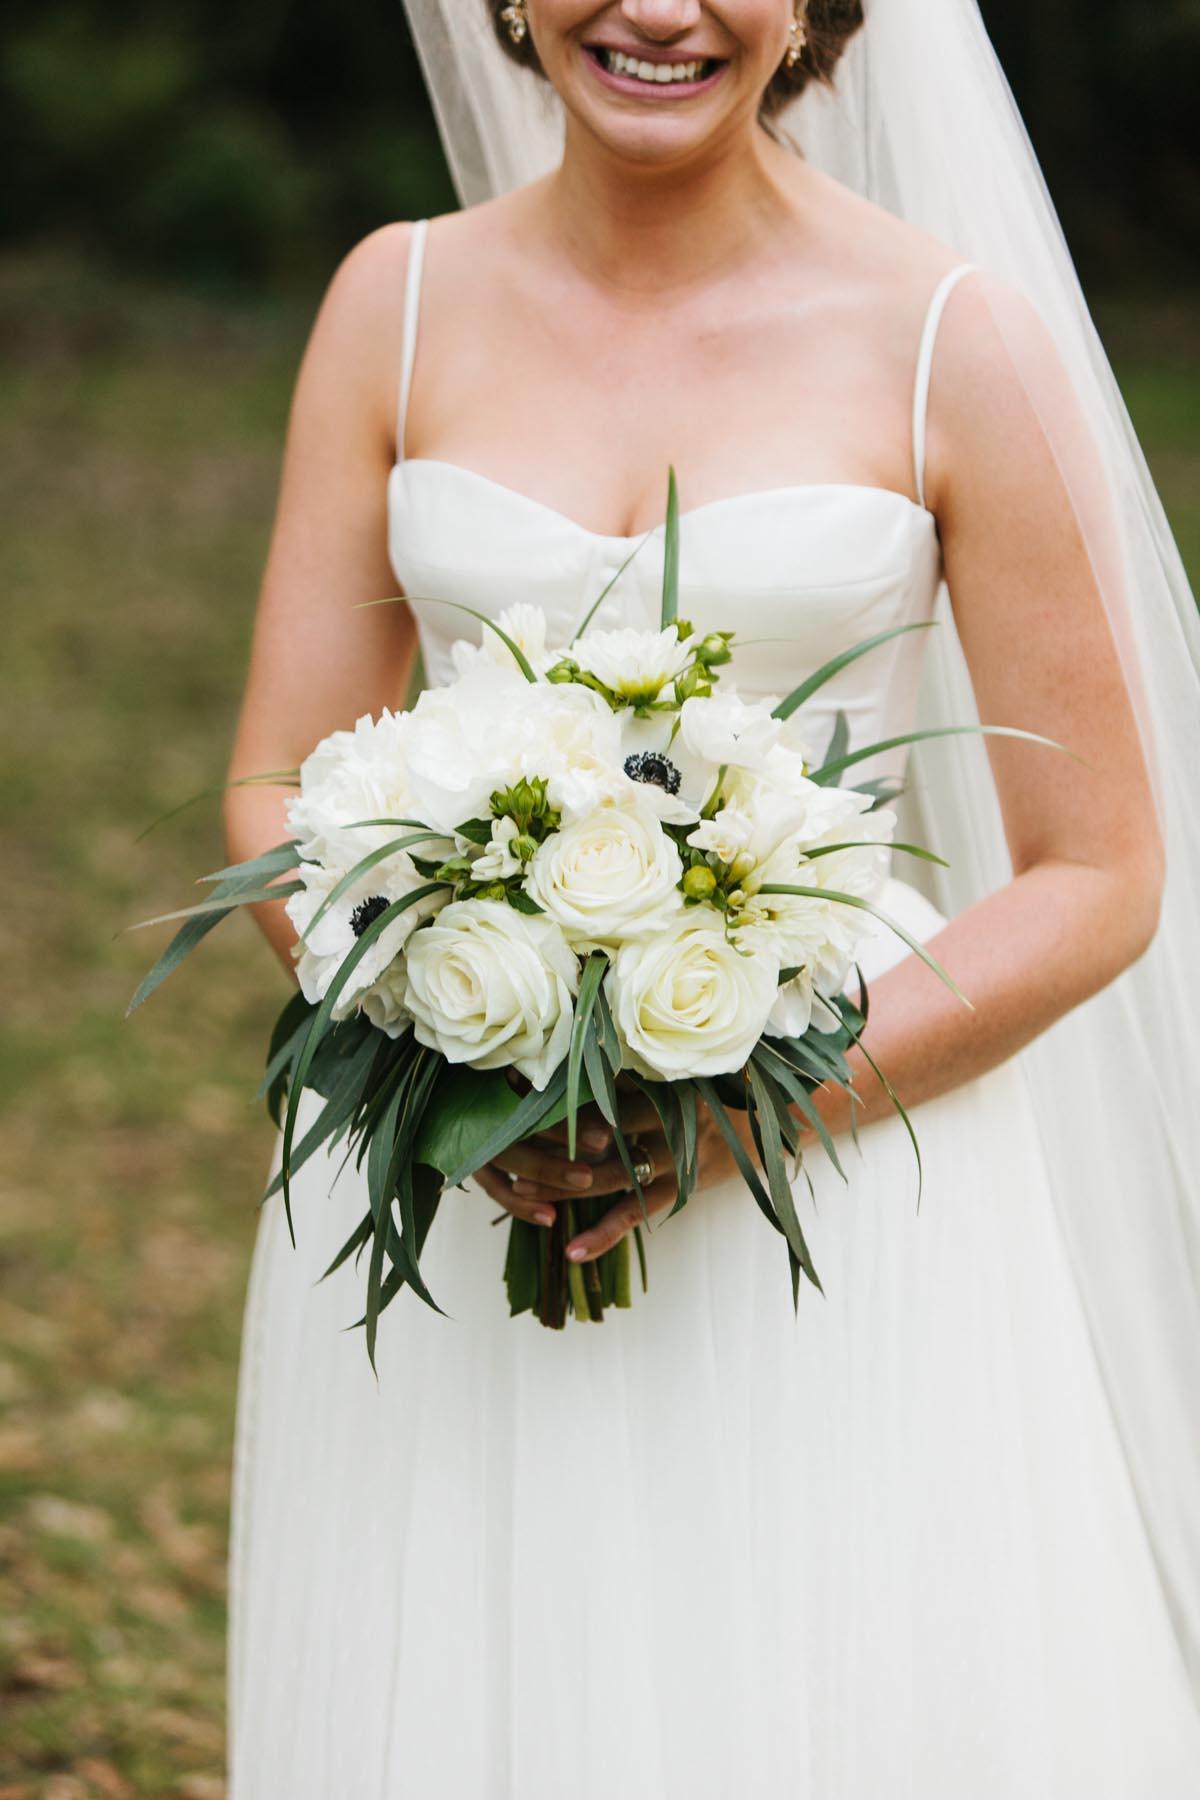 lowry wedding blog eden garden florida wedding-91